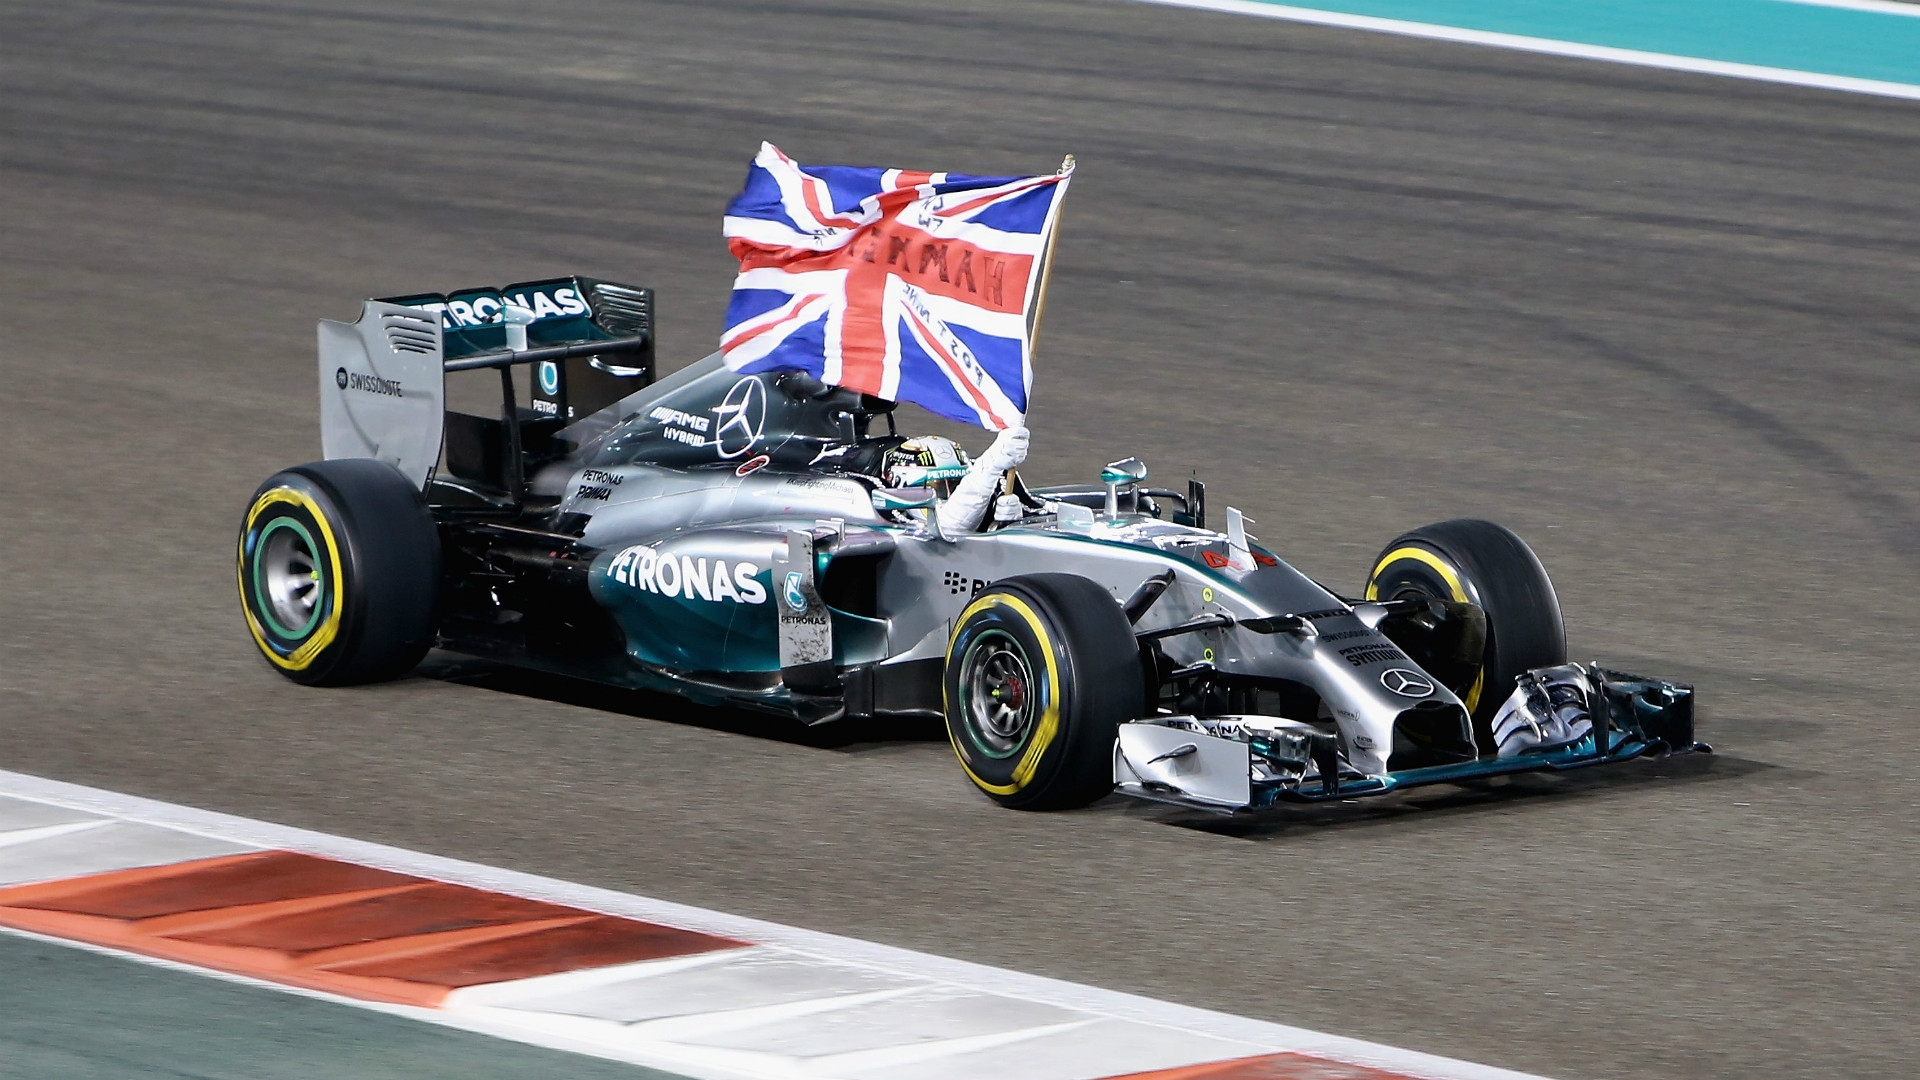 2020-05-16 F1 Formula 1 Hamilton